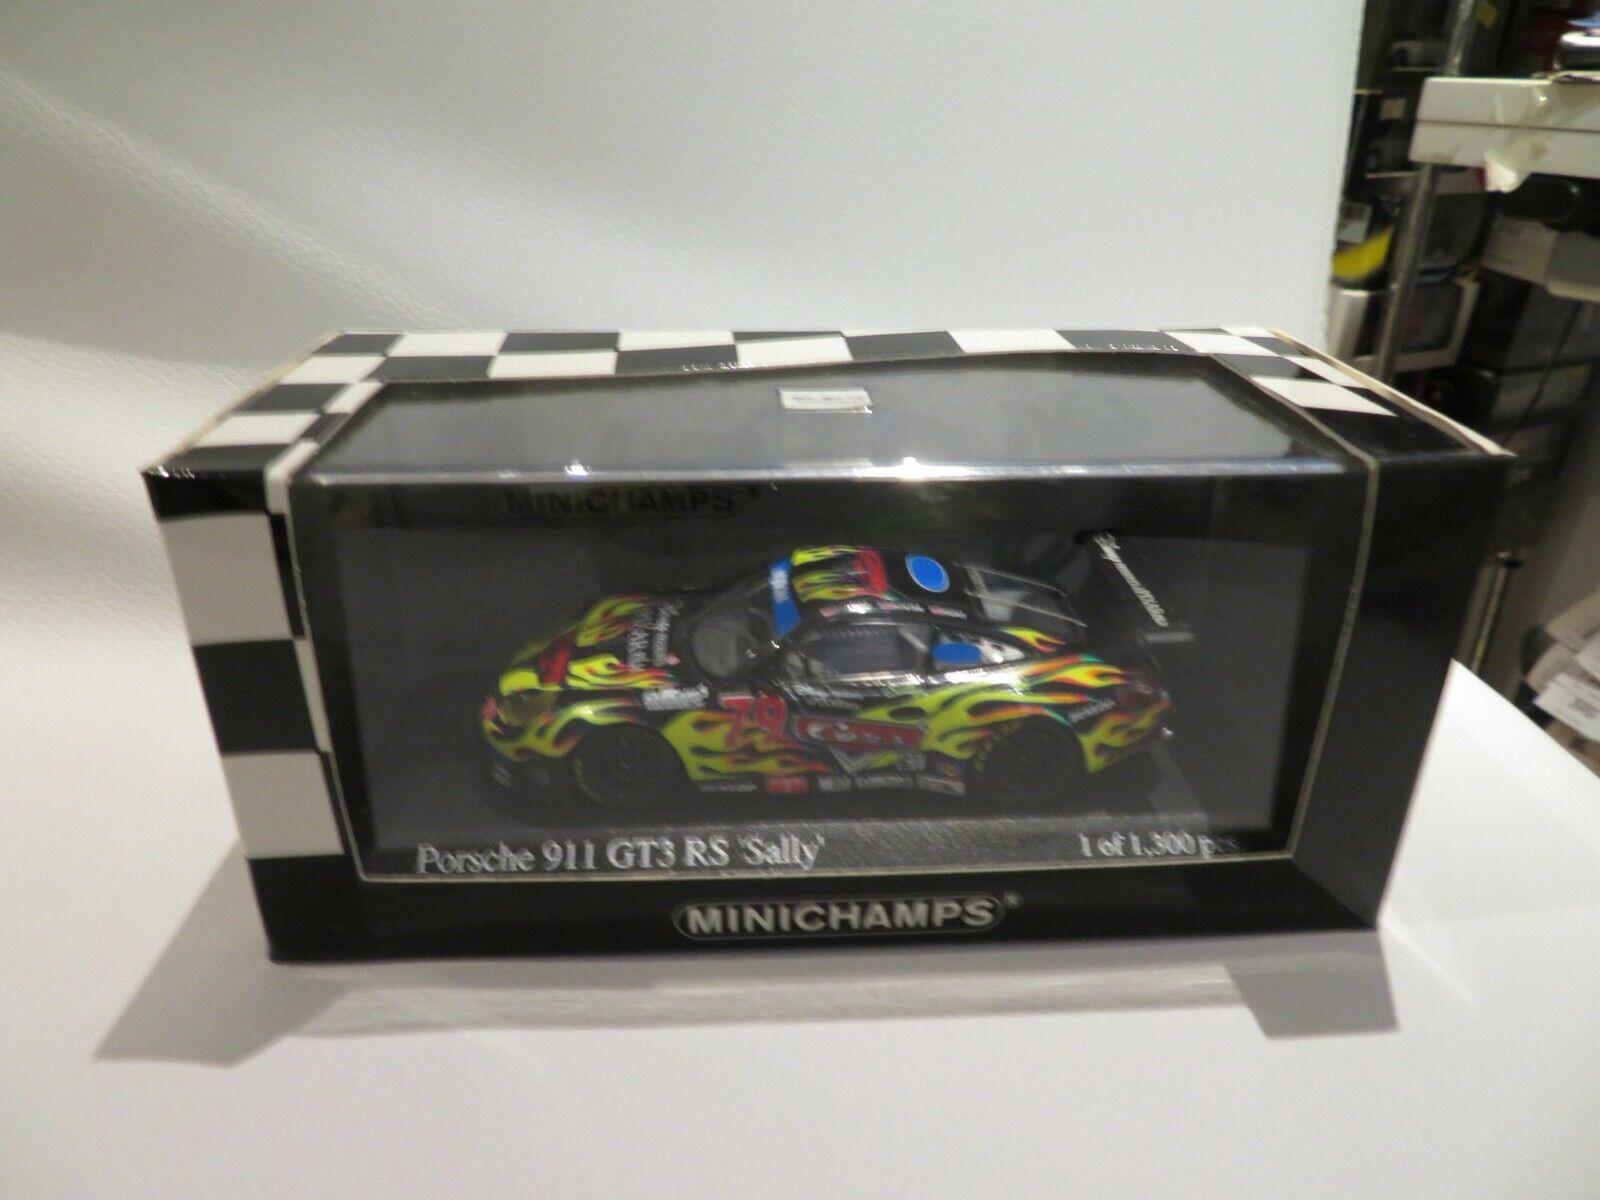 grandi risparmi 1 43 Minichamps Porsche 911 GT3RS Stuttiy GP GP GP Miami (2004) diecast  saldi